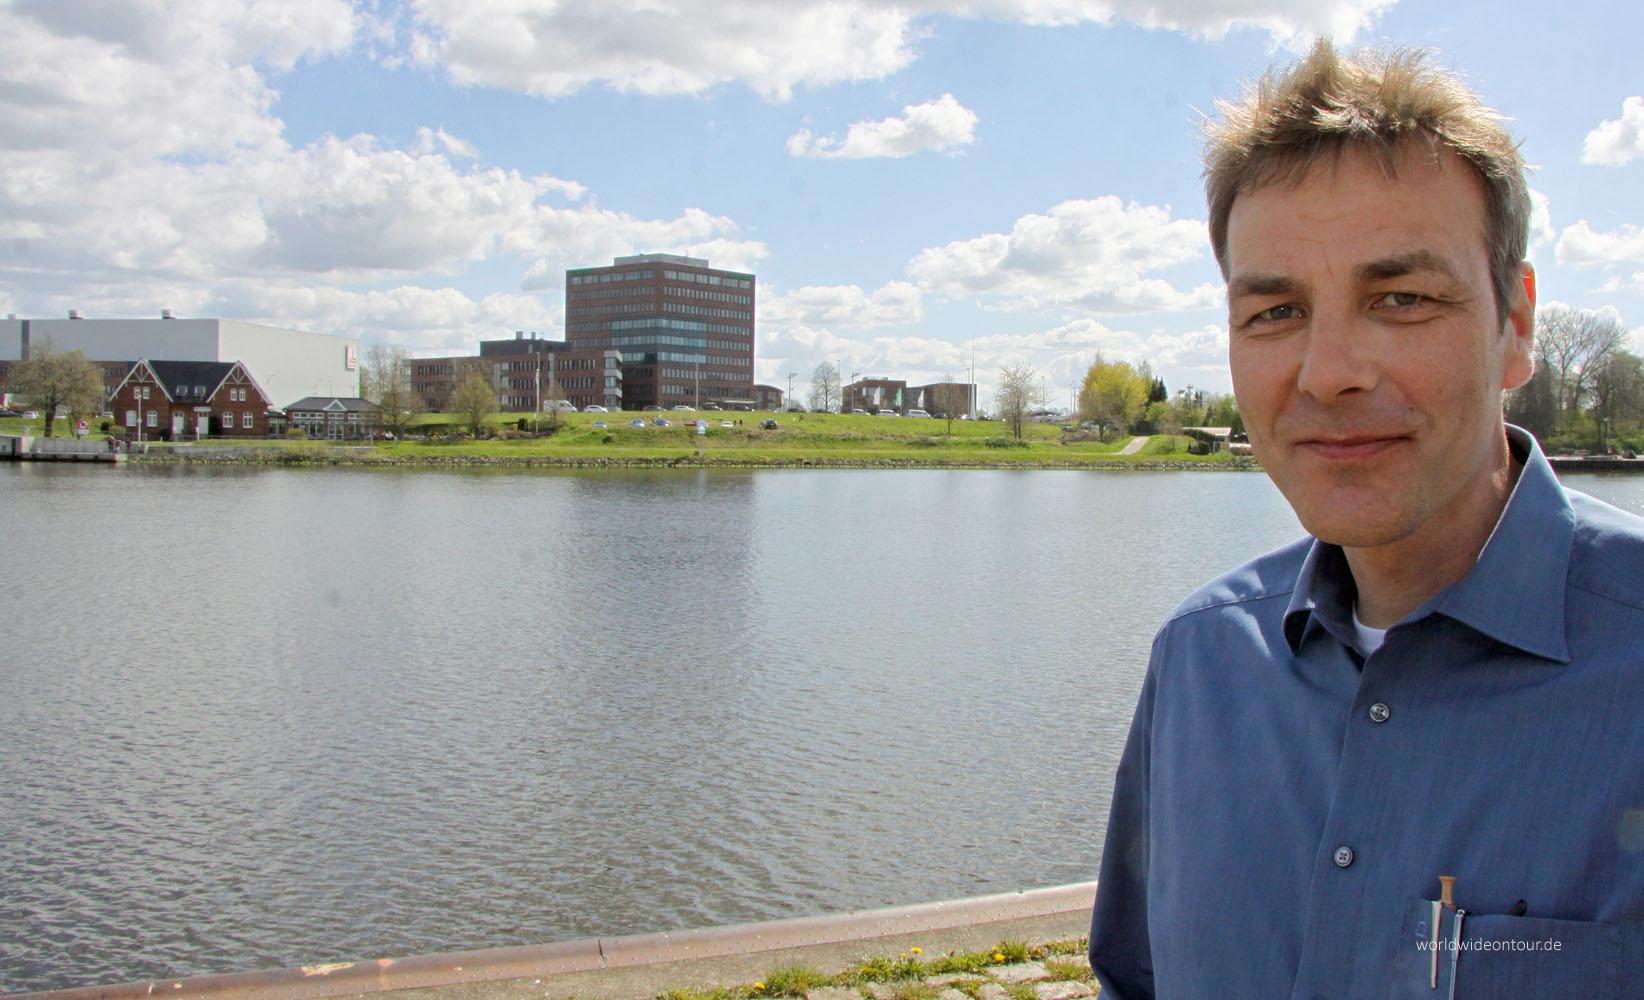 RegManager Marco Neumann whe